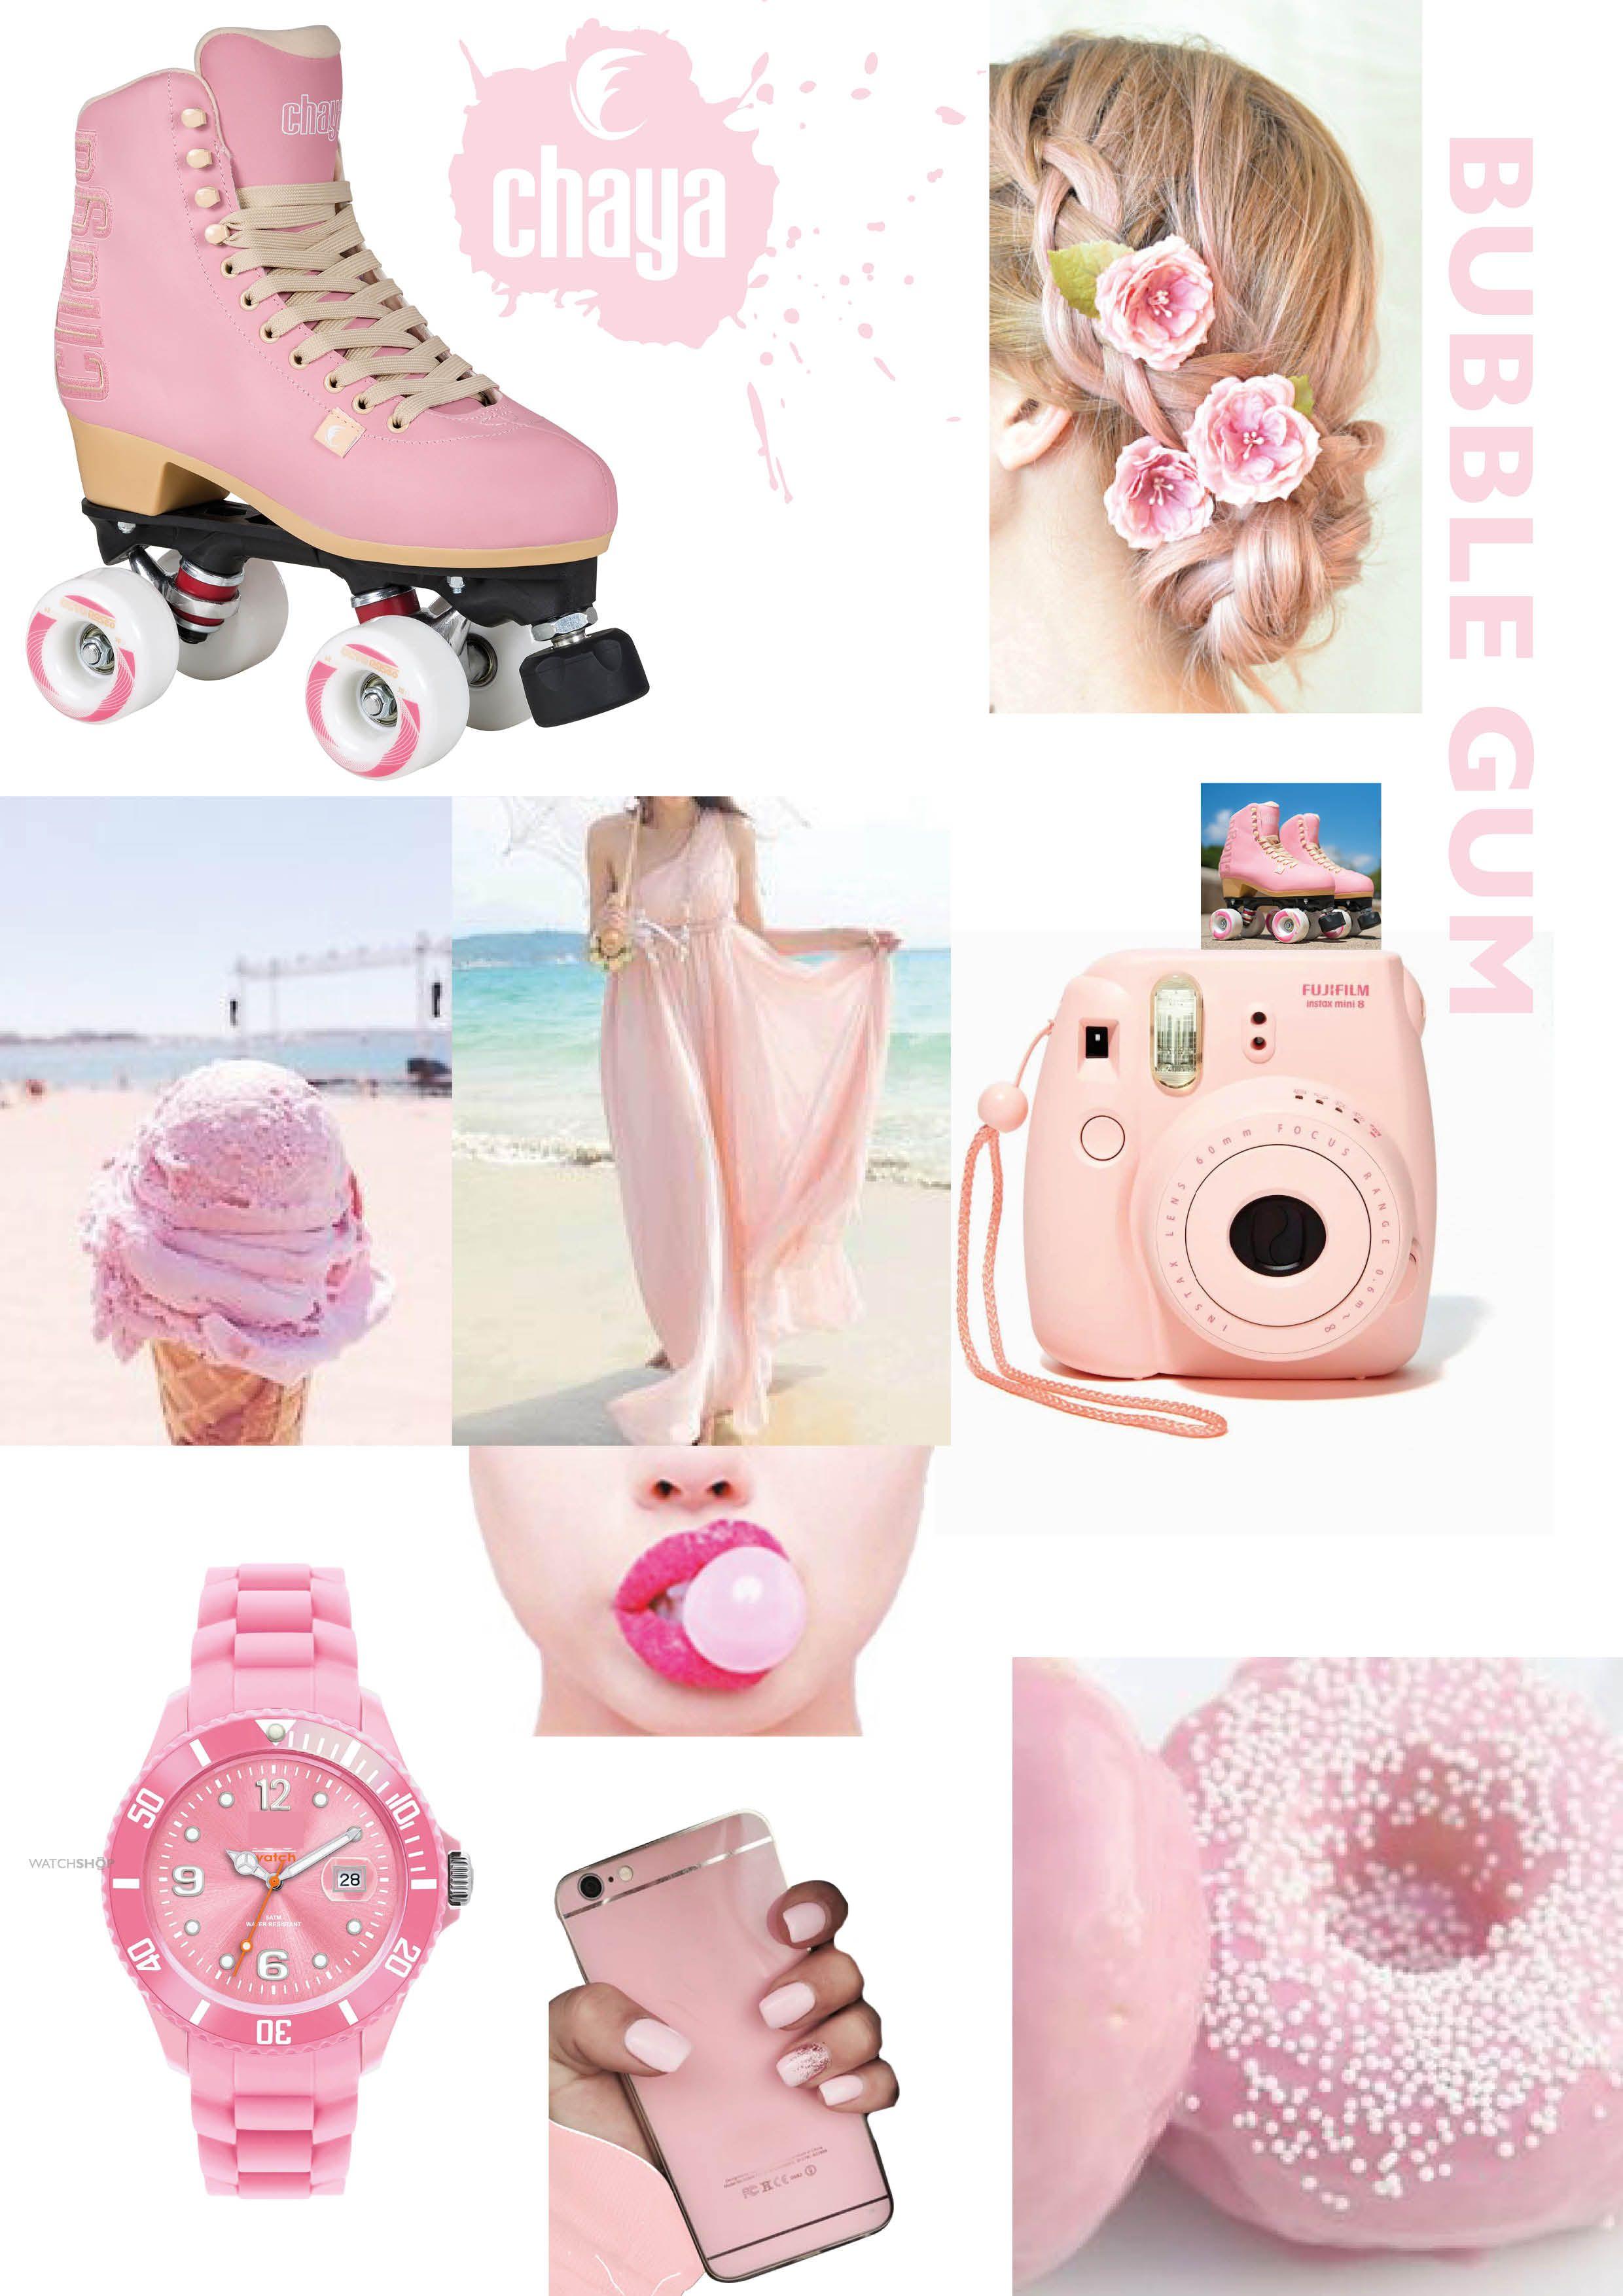 397d4674925 #chaya #itistime #rollerskates #quads #vintage #retro #fashion #lifestyle  #pink #pretty #colour #instax #icecream #women